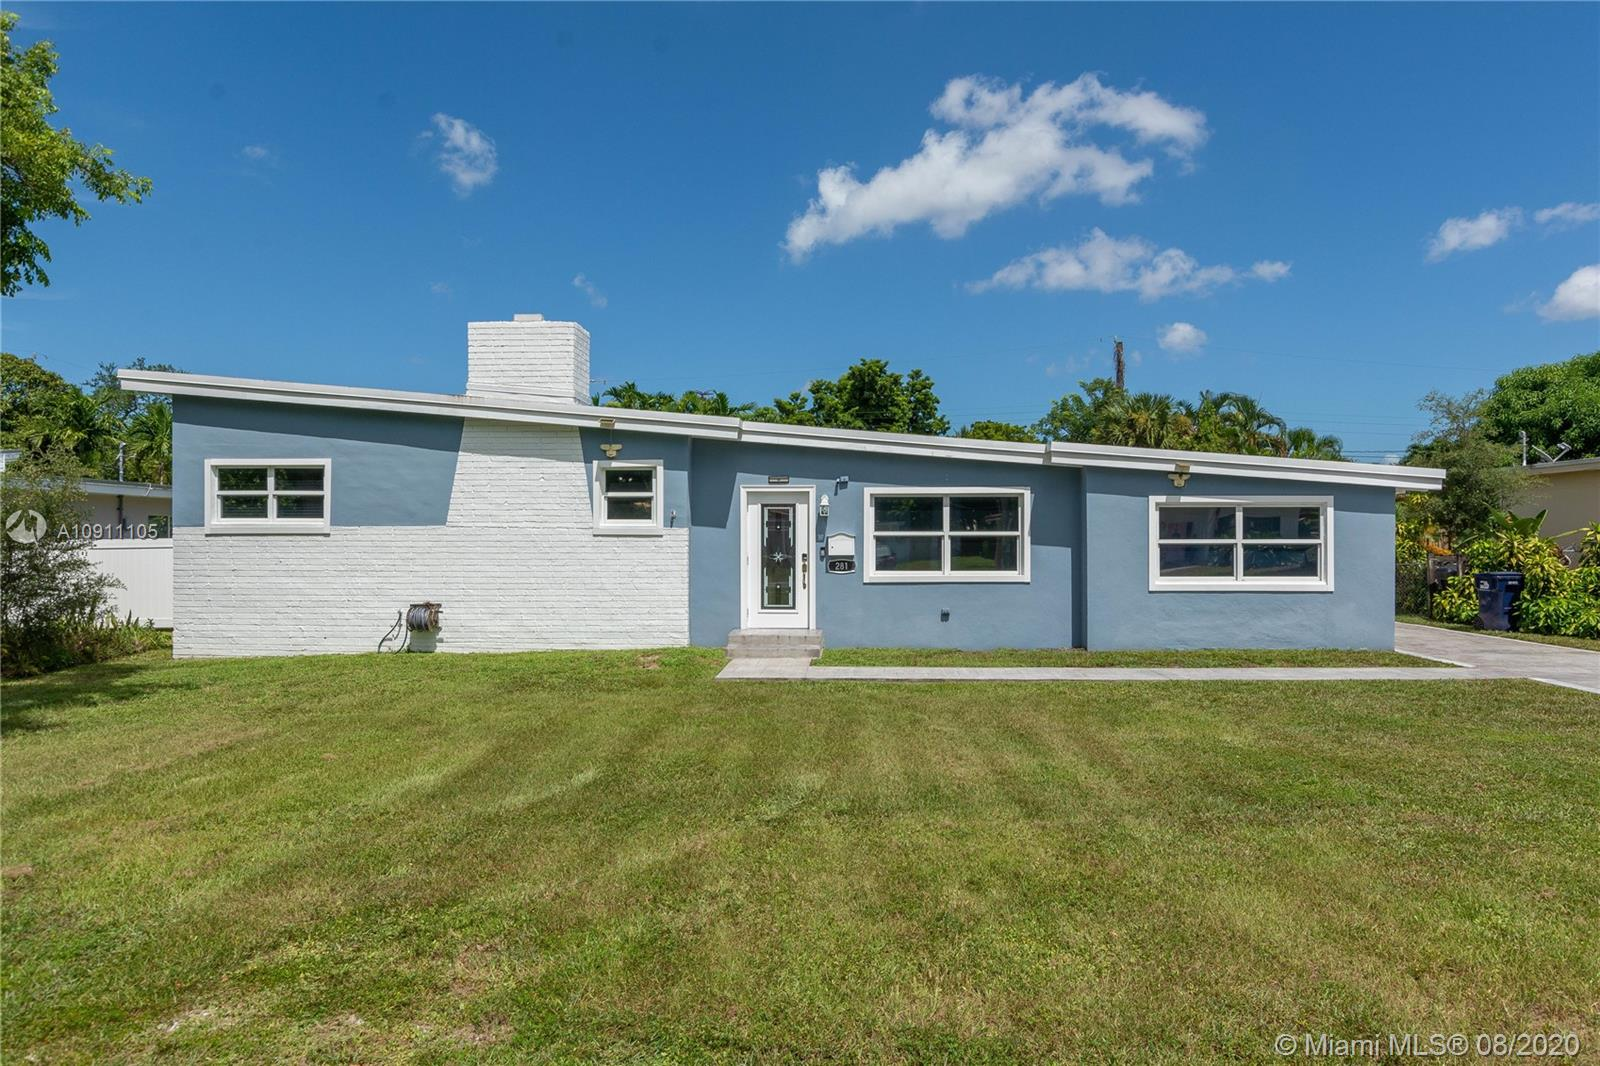 281 Iroquois St, Miami Springs FL 33166